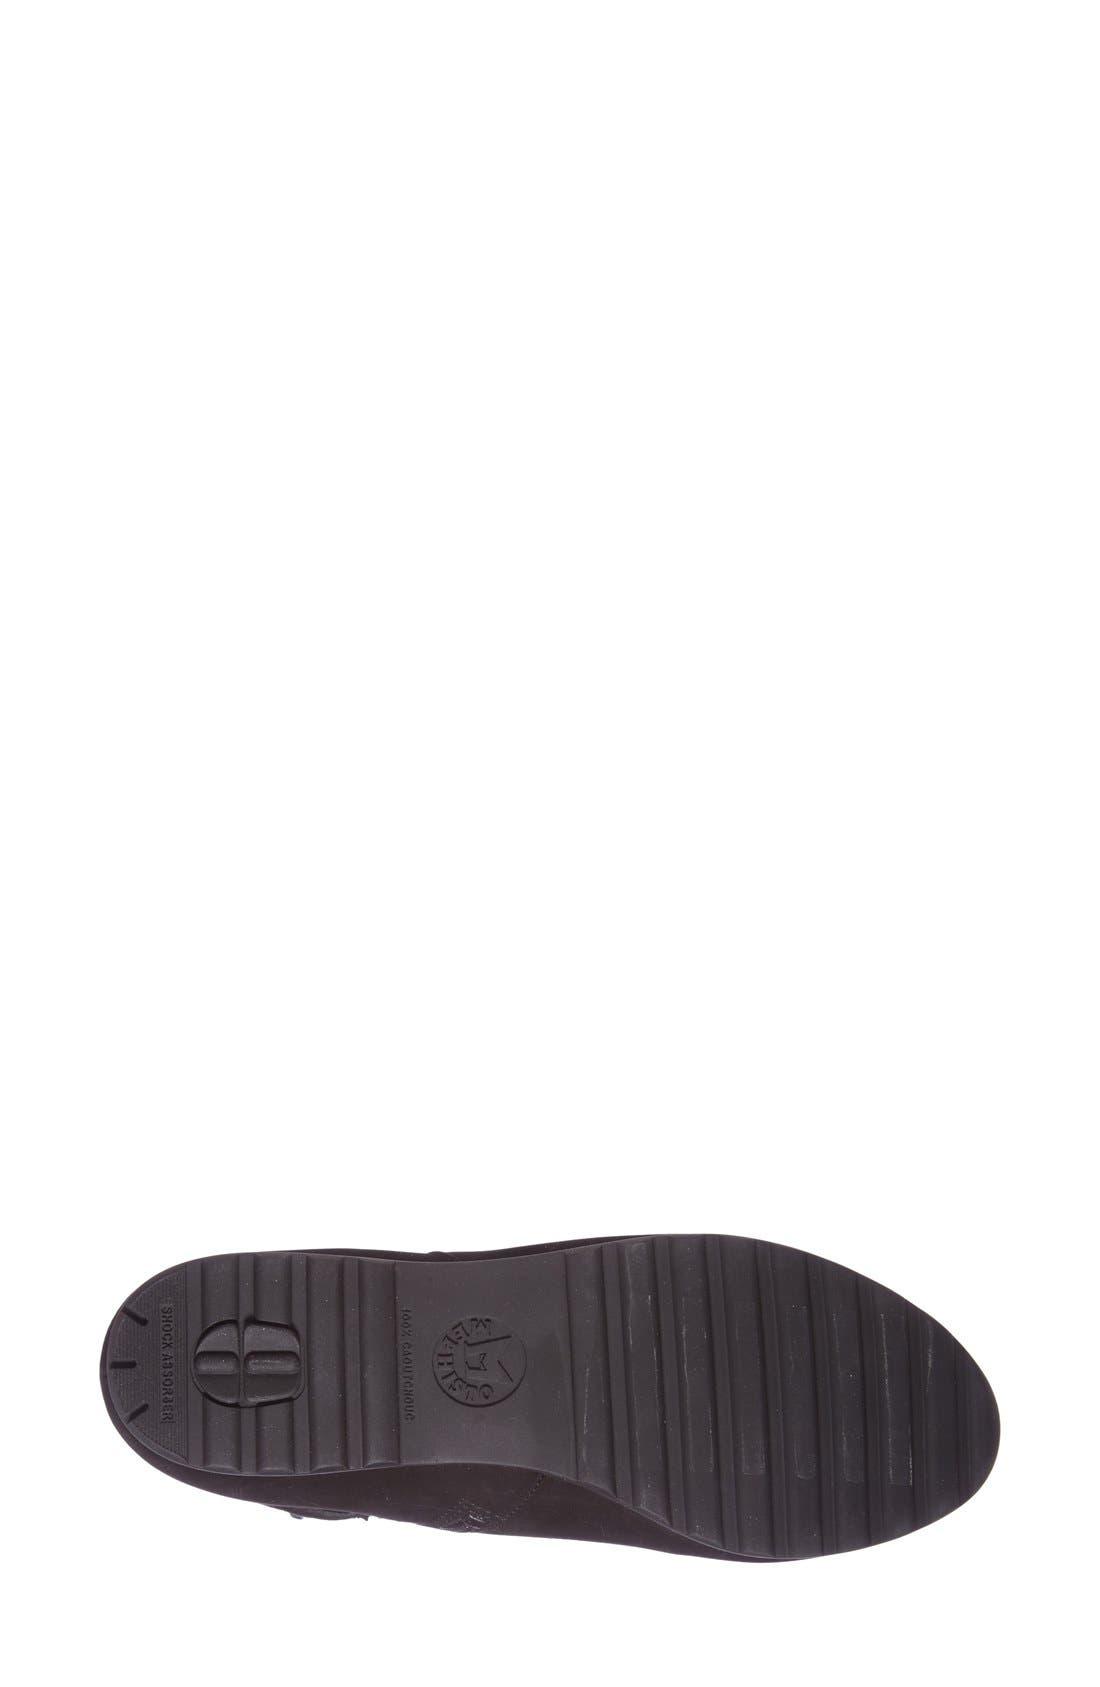 'Azzura' Boot,                             Alternate thumbnail 4, color,                             012